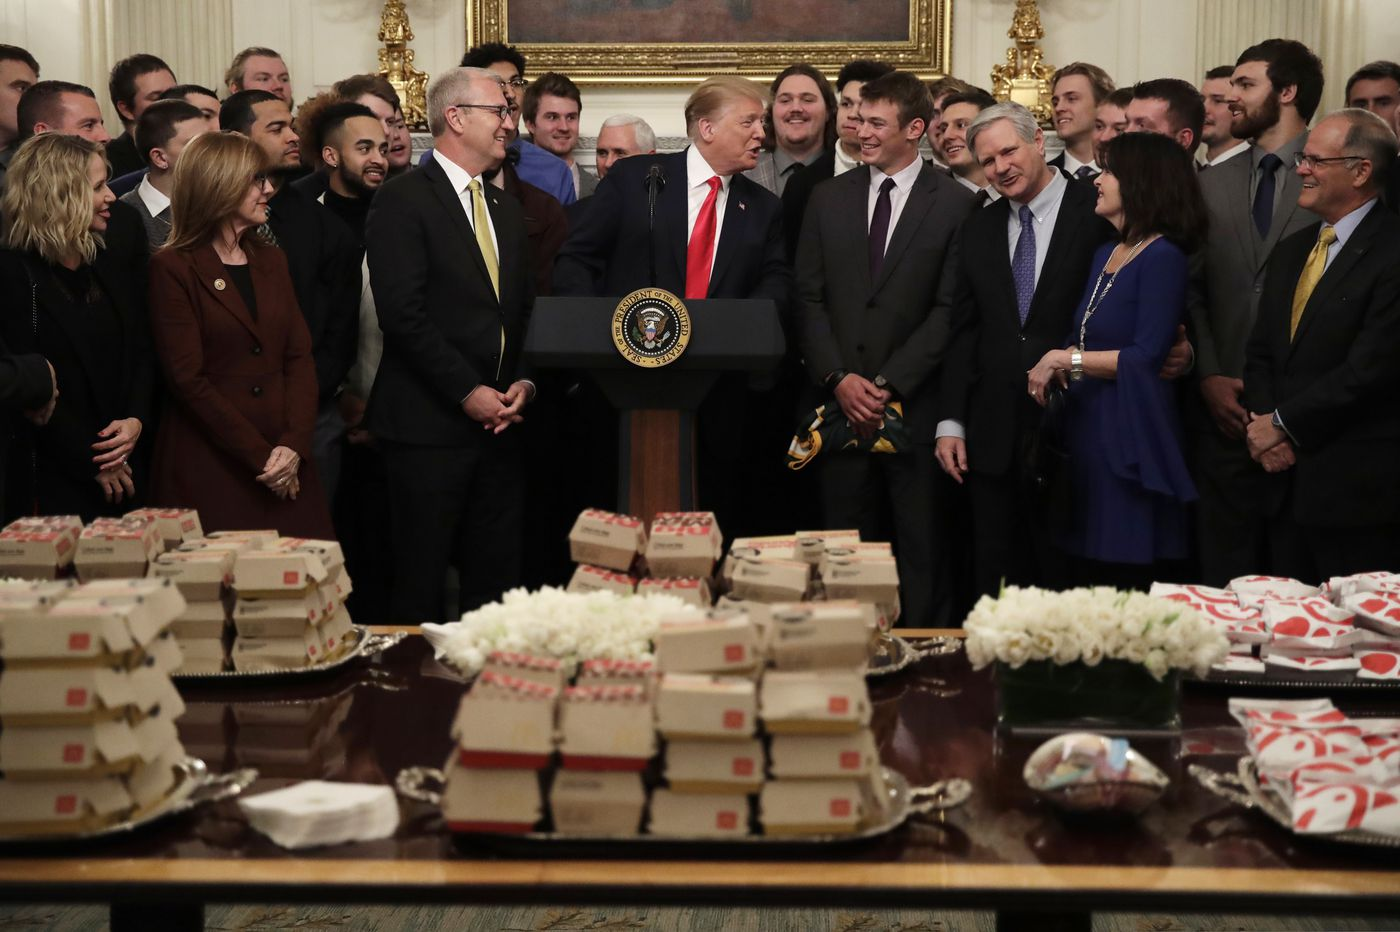 Trump serves fast food to North Dakota State football championship team